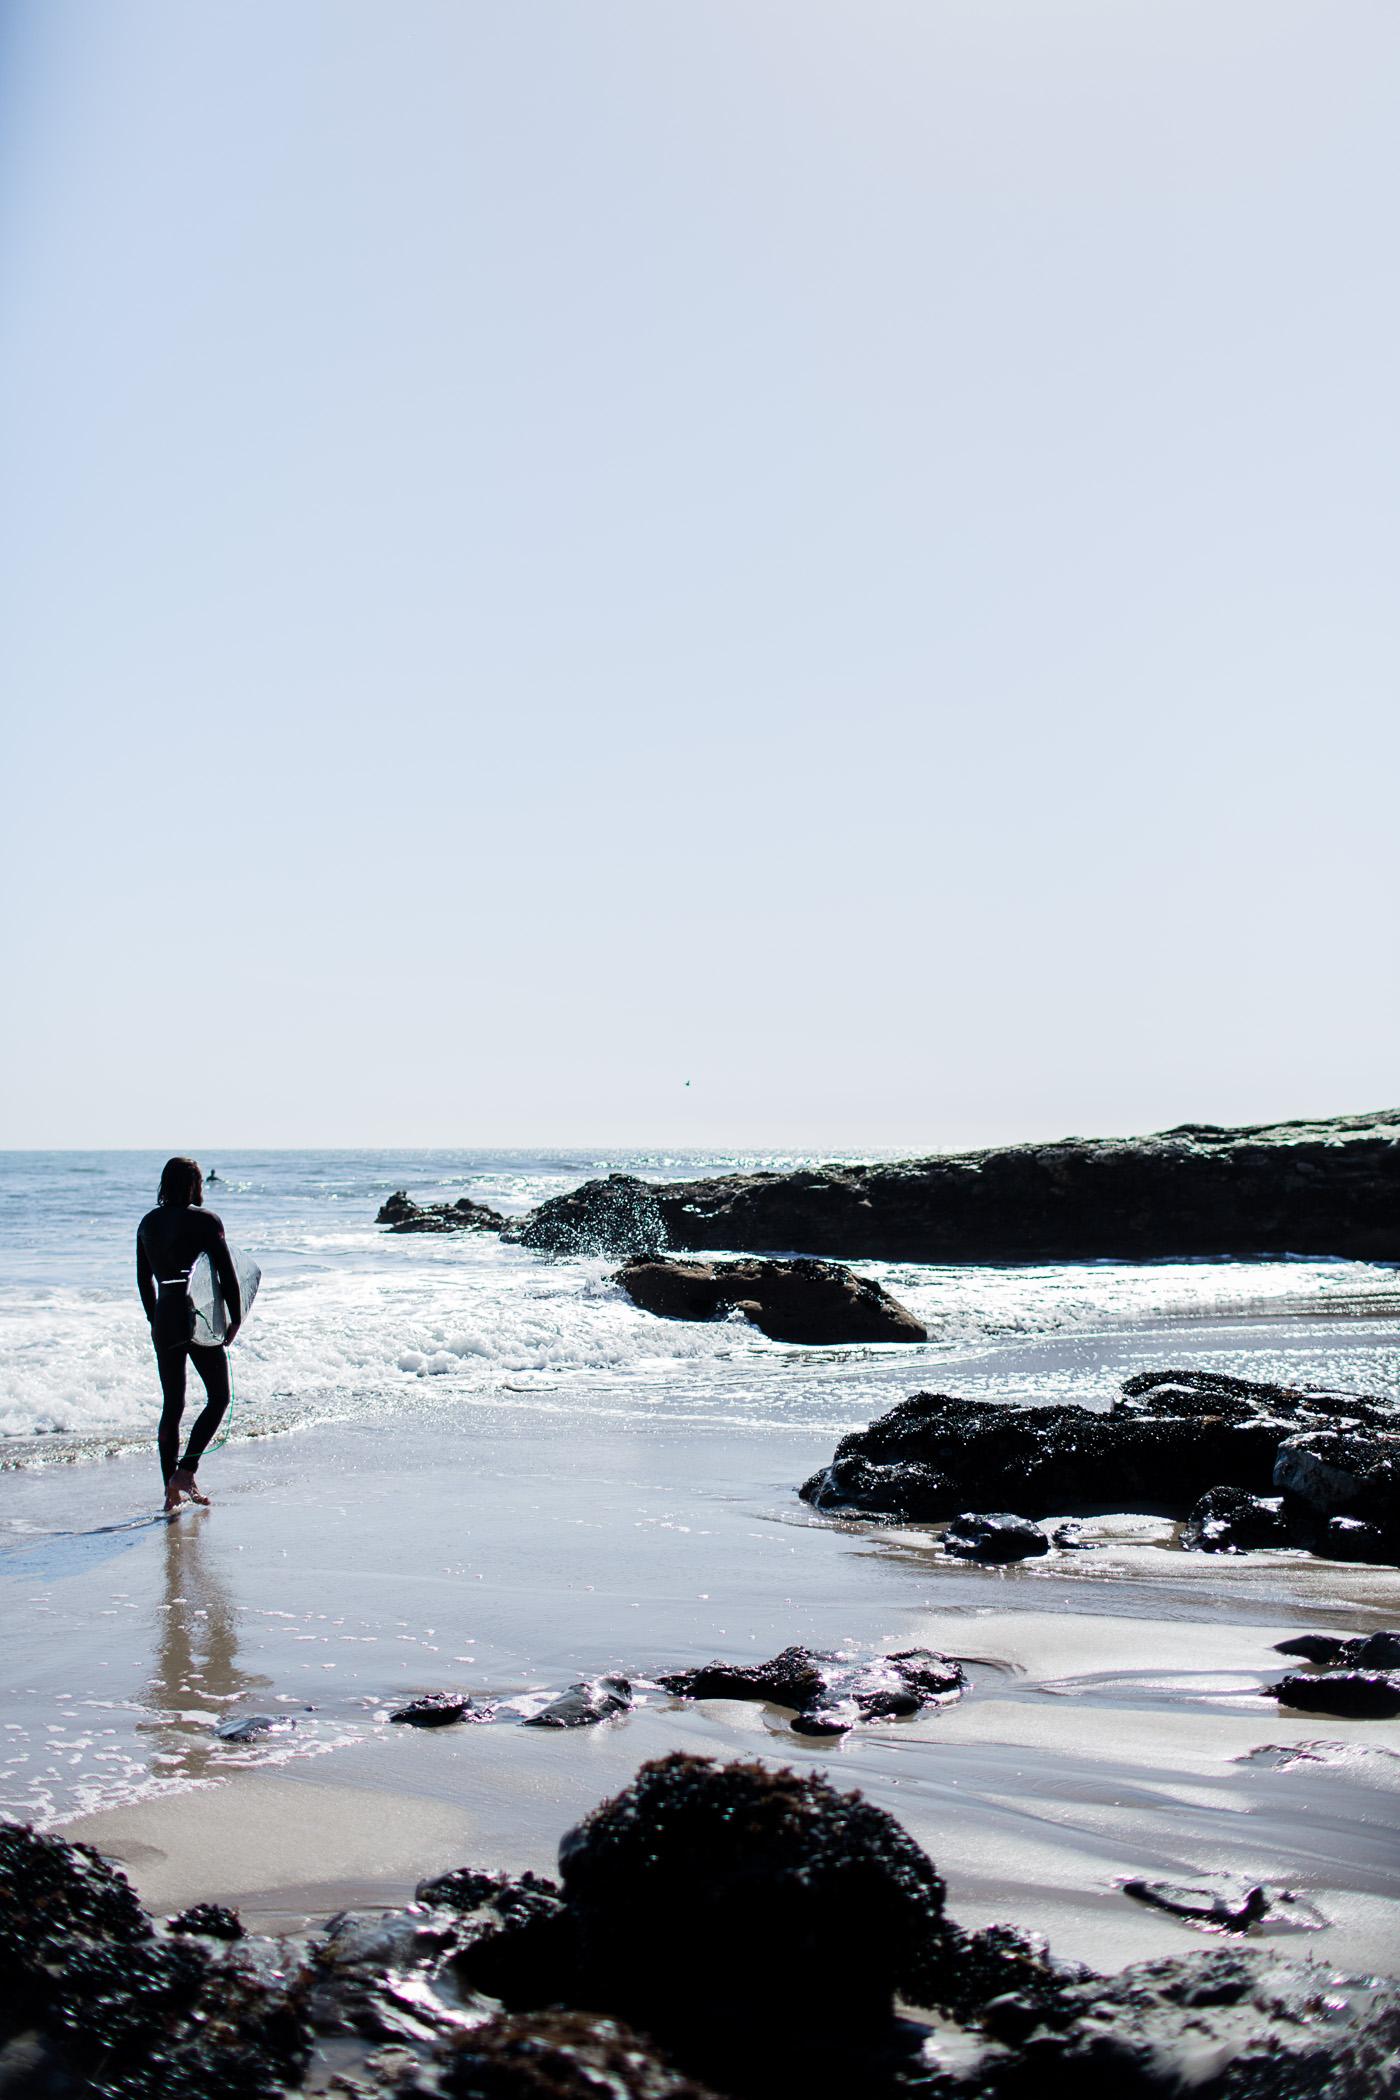 Mitchell's Cove Beach in Santa Cruz, California